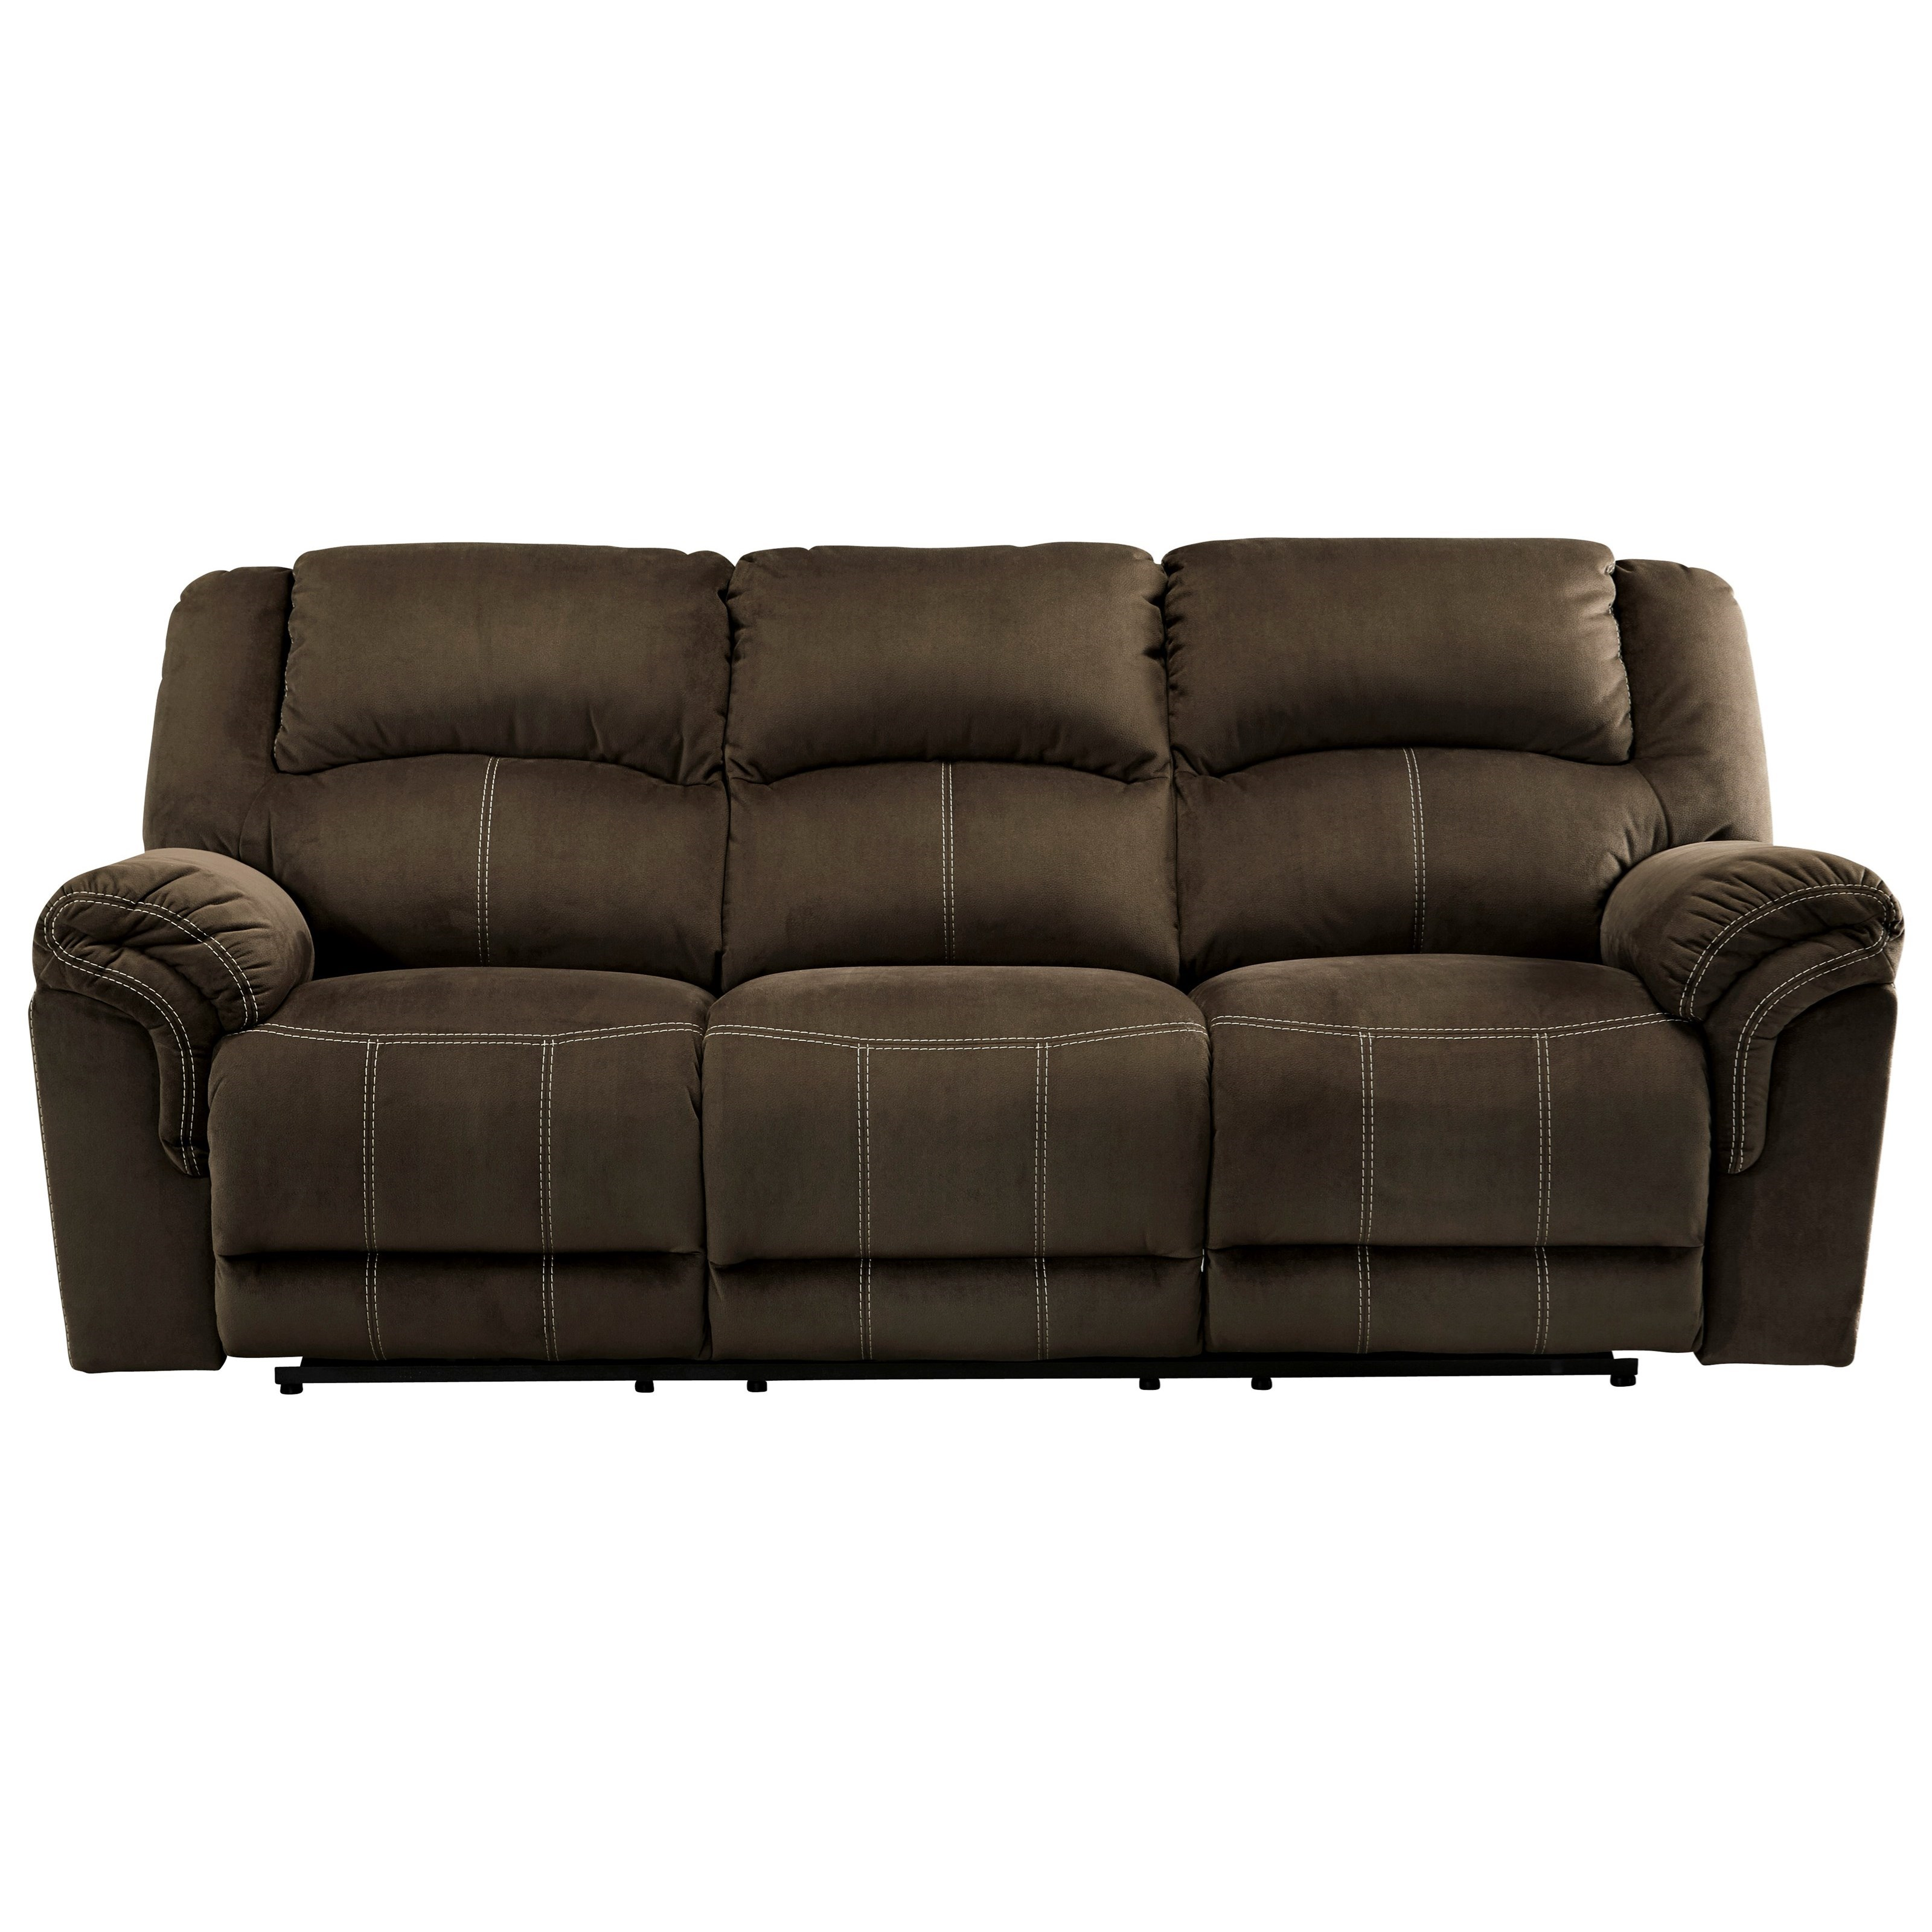 Signature design by ashley quinnlyn 9570187 reclining for Sofas el tresillo